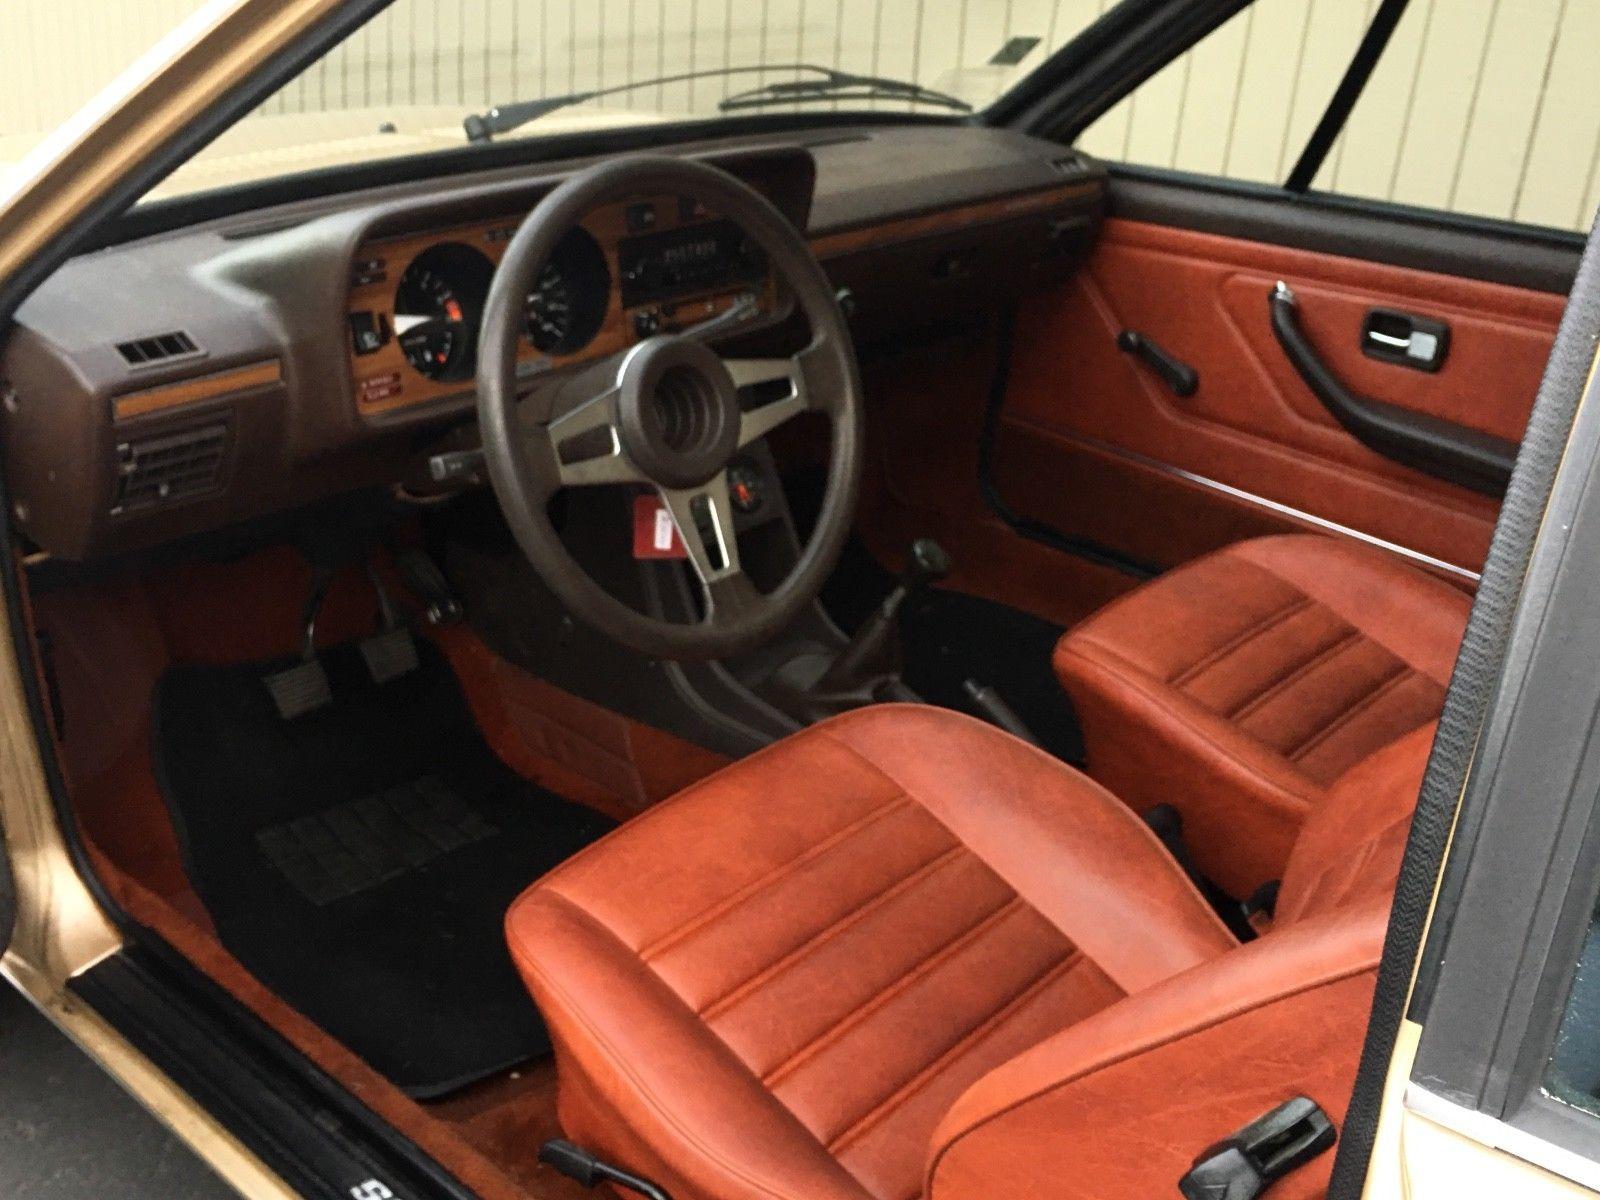 1978 Volkswagen Scirocco interior